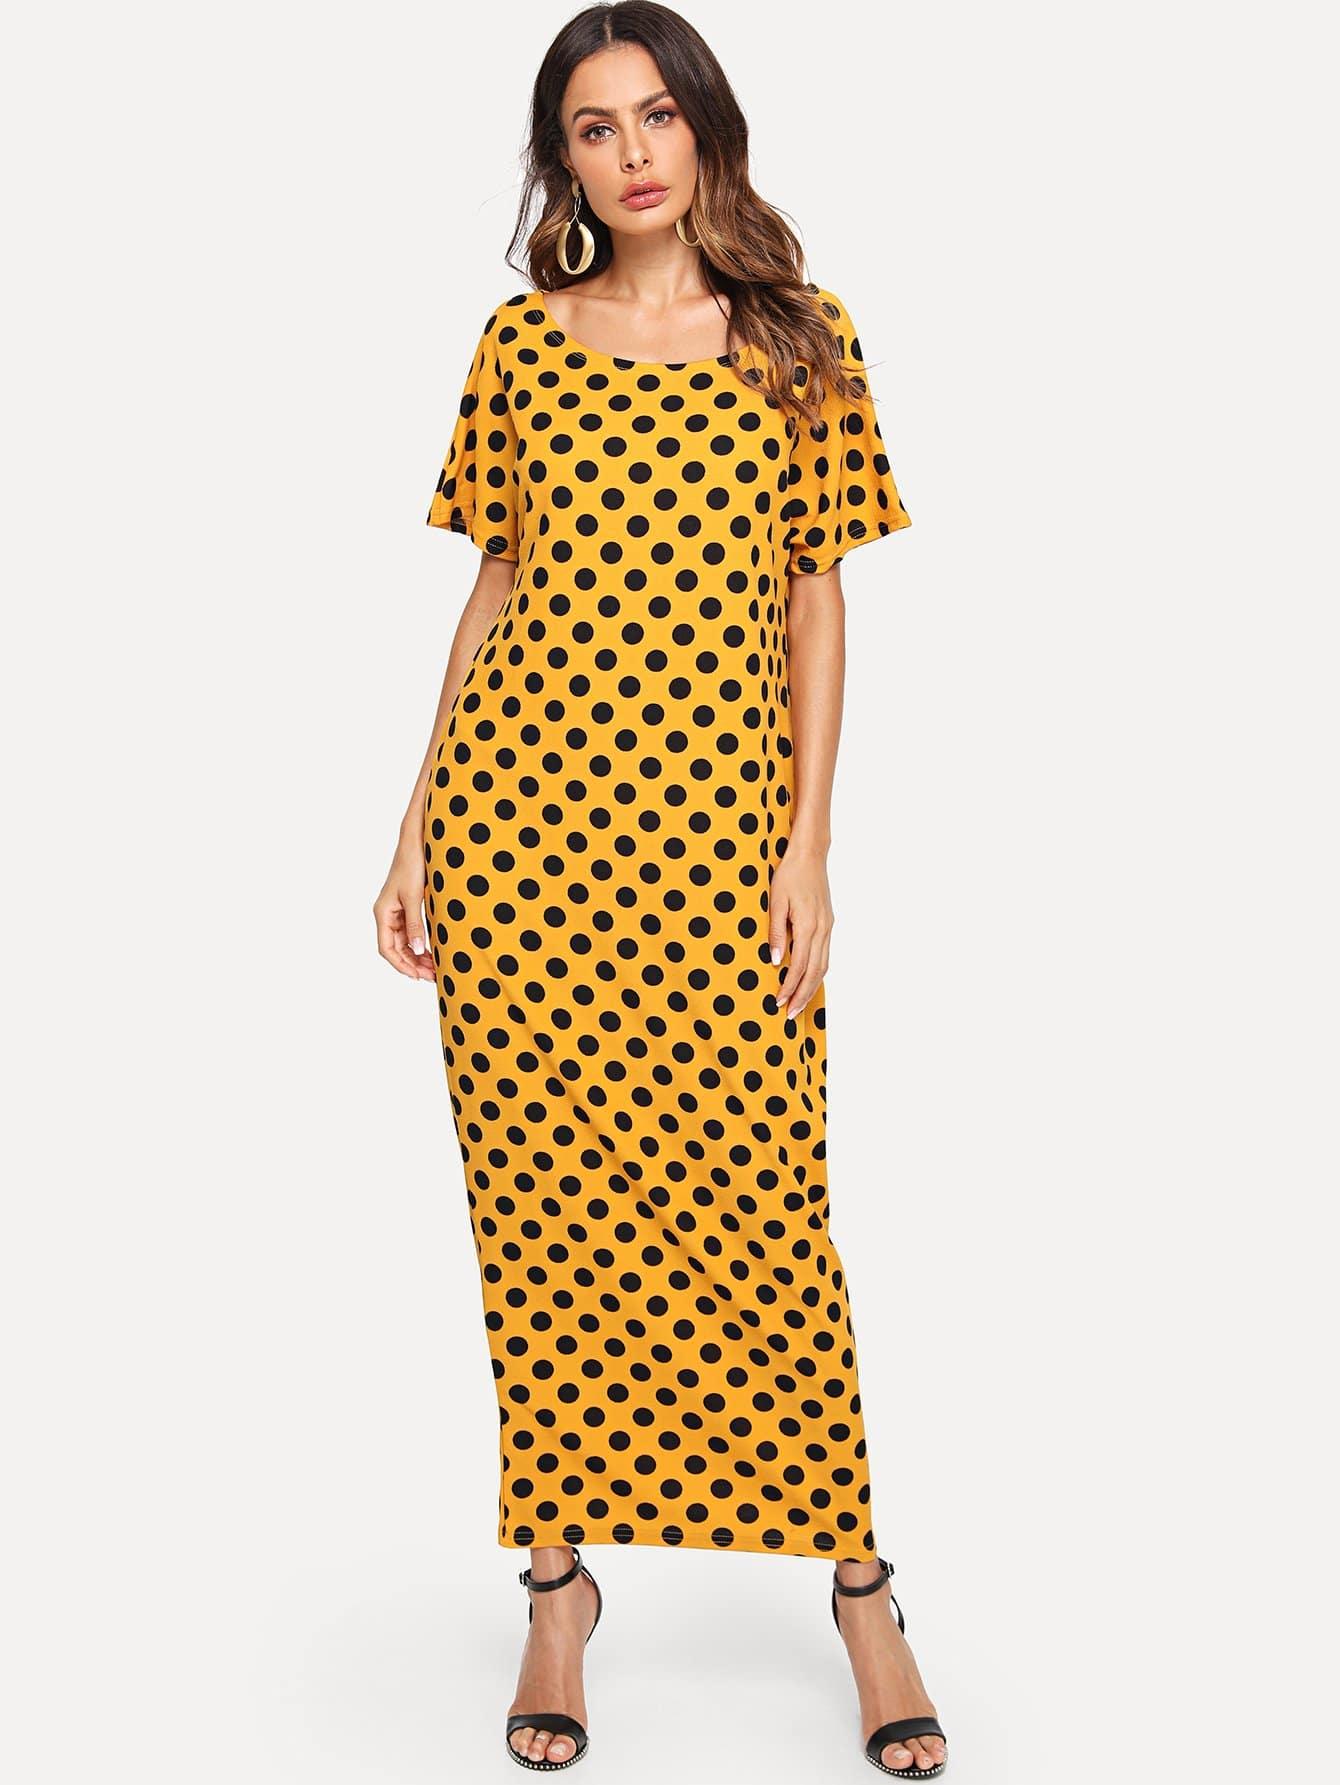 Hidden Pocket Detail Polka Dot Cocoon Dress lace panel pearl detail polka dot dress